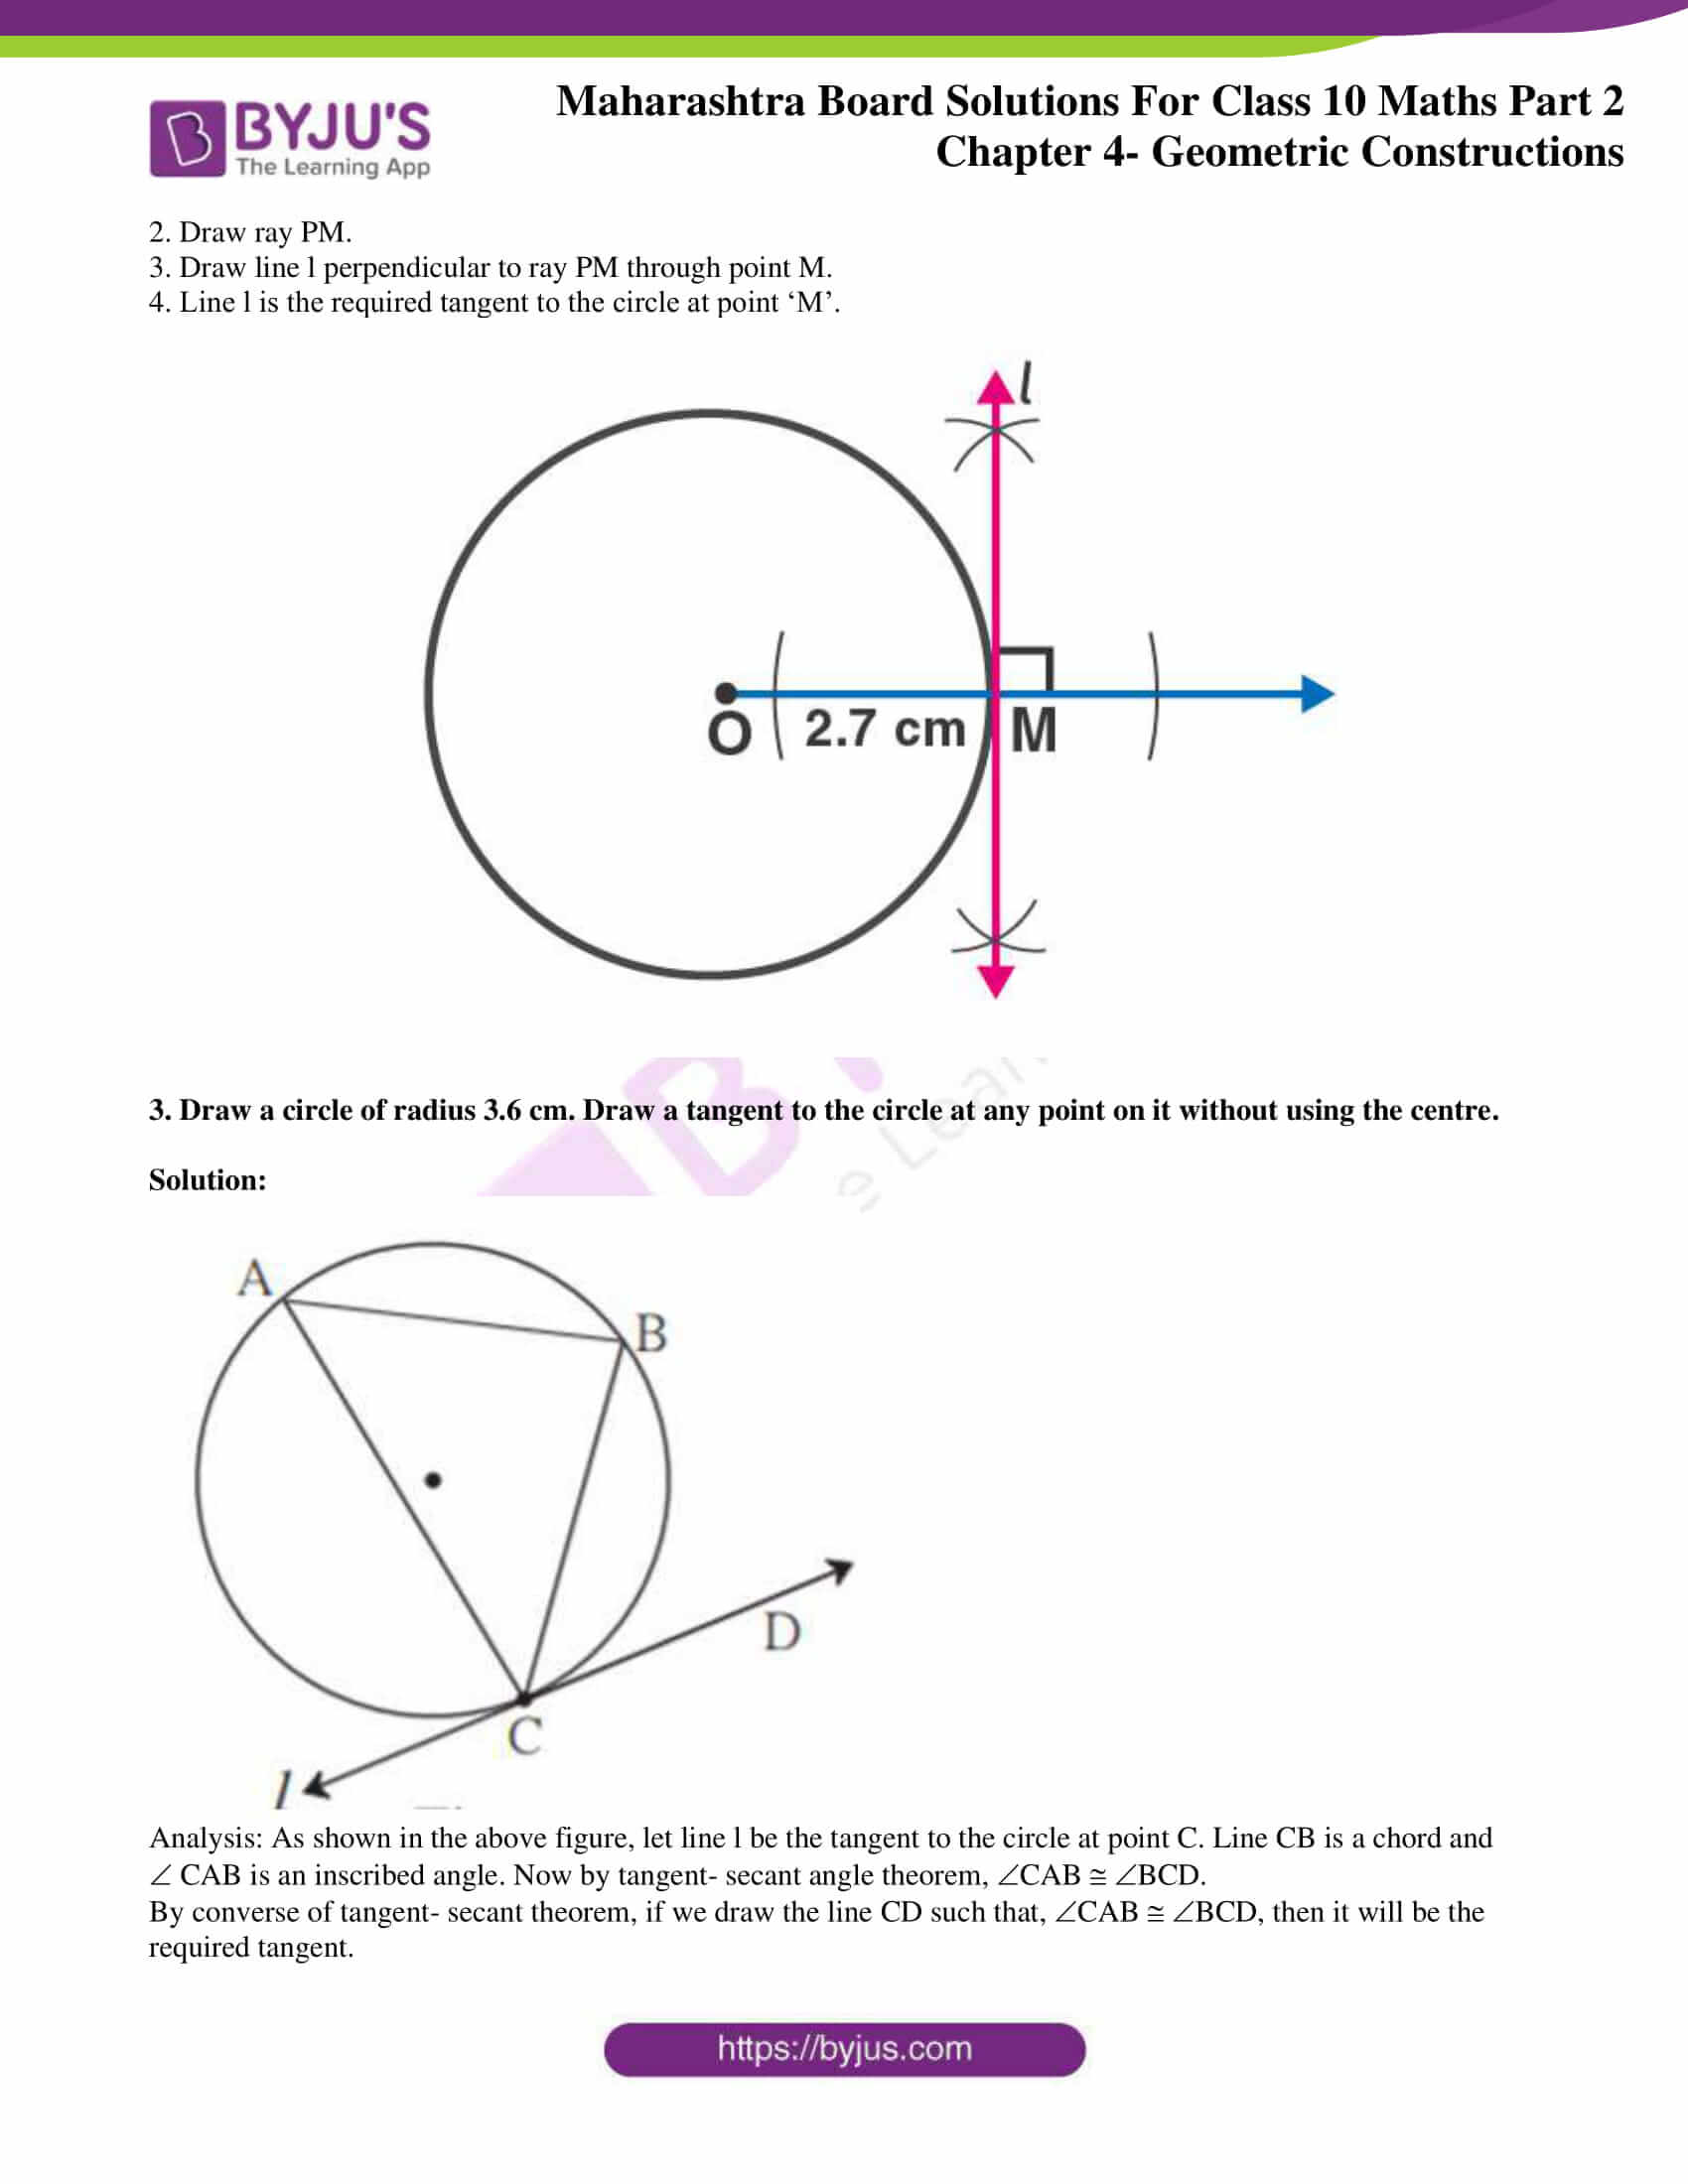 msbshse sol class 10 maths part 2 chapter 4 06